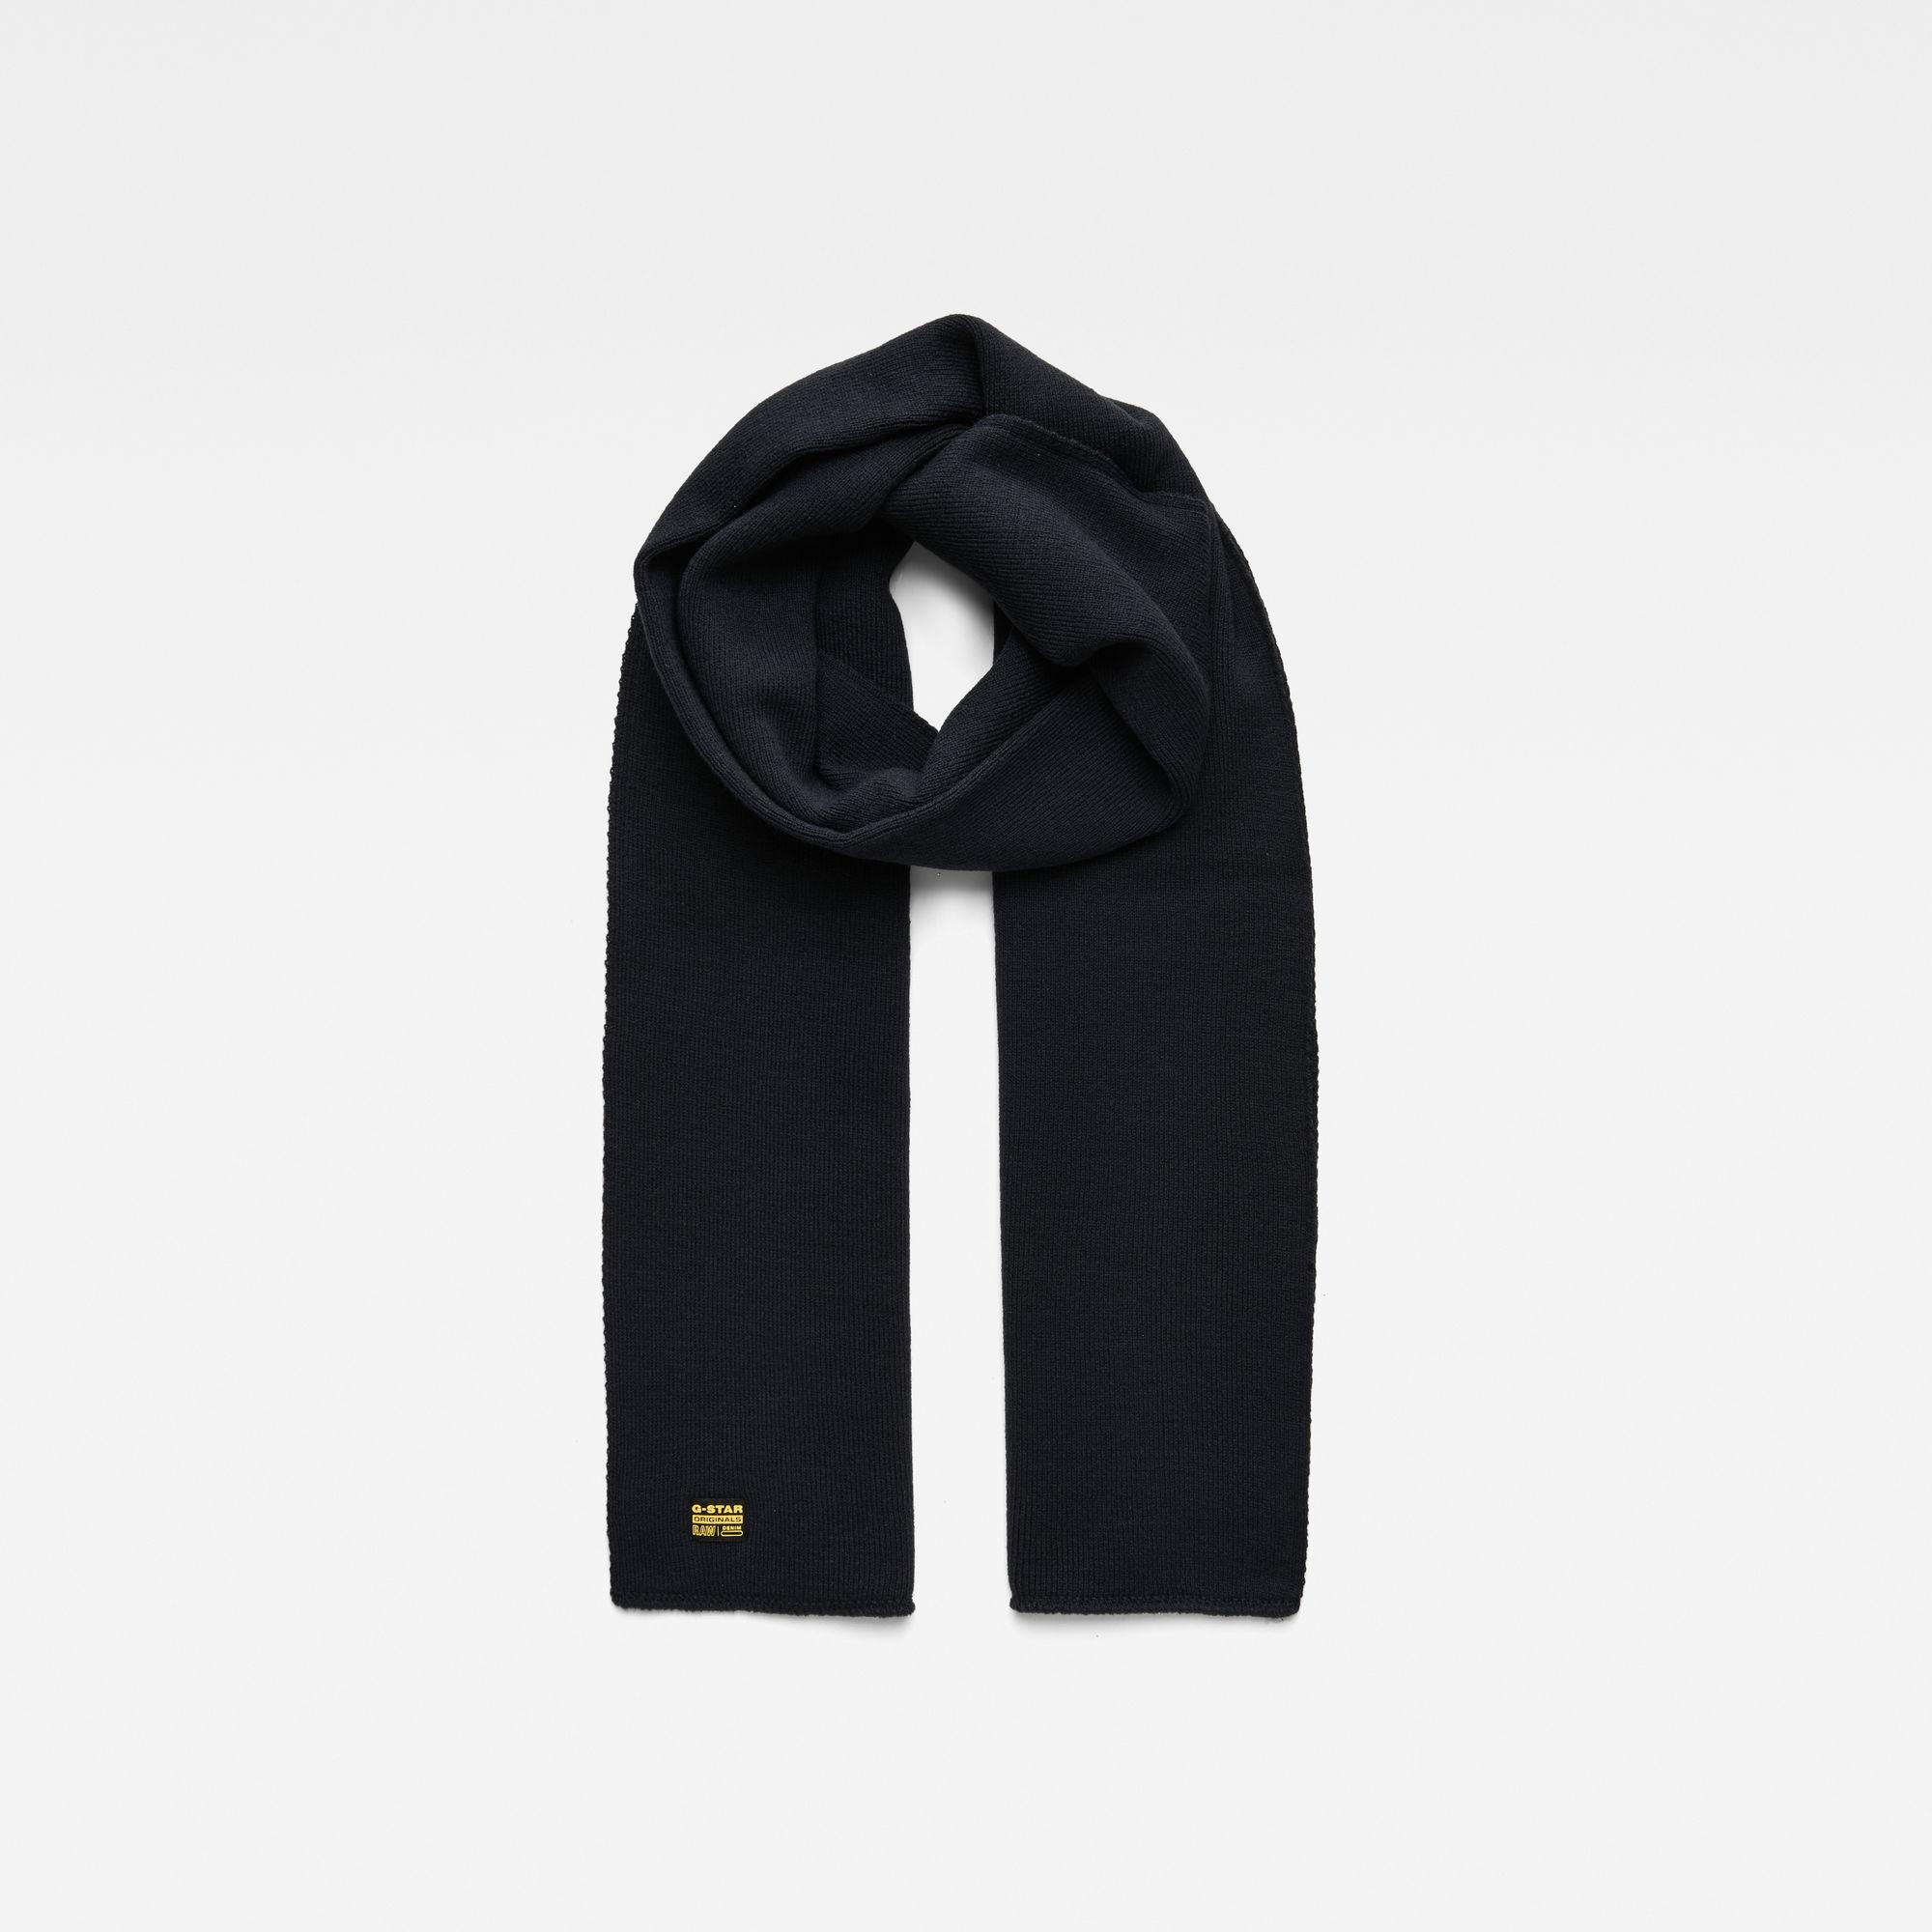 G-Star RAW Heren Effo scarf Donkerblauw